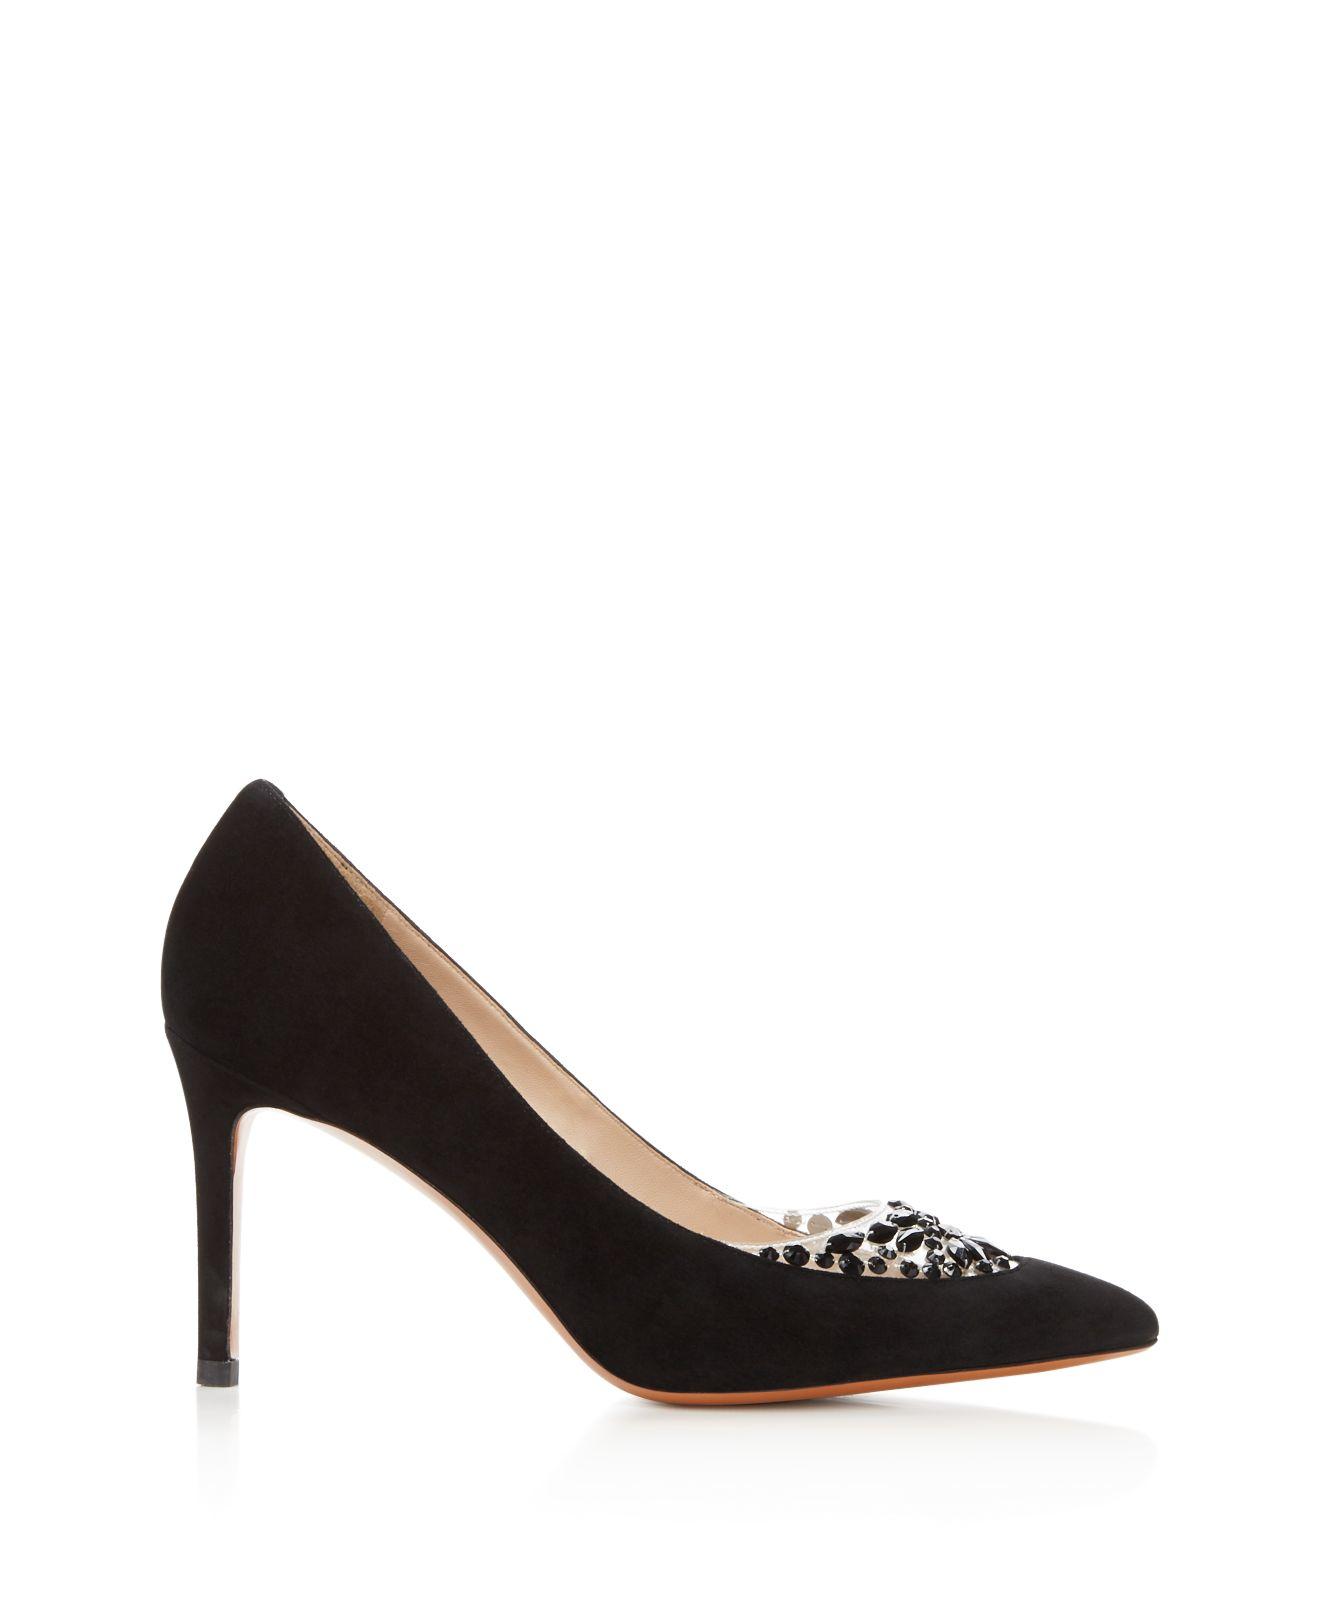 Sergio Rossi Black Shoes